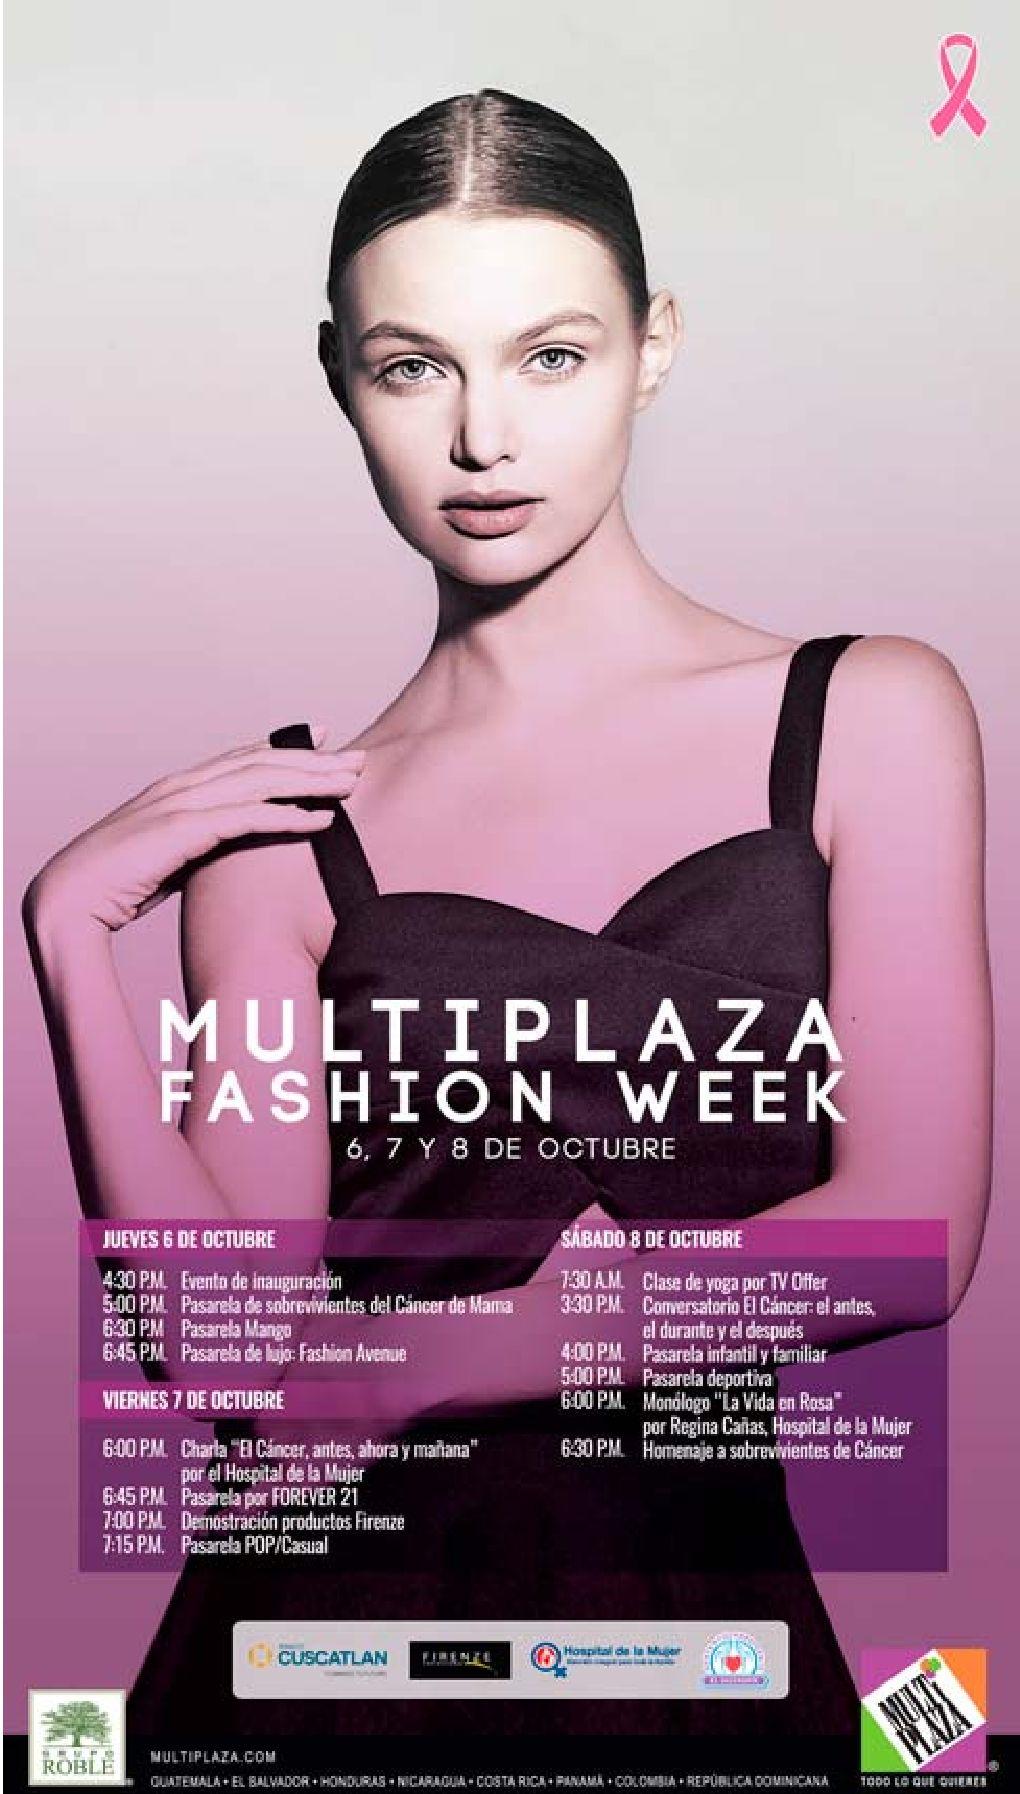 multiplaza-fashion-week-apoyando-al-cancer-de-mama